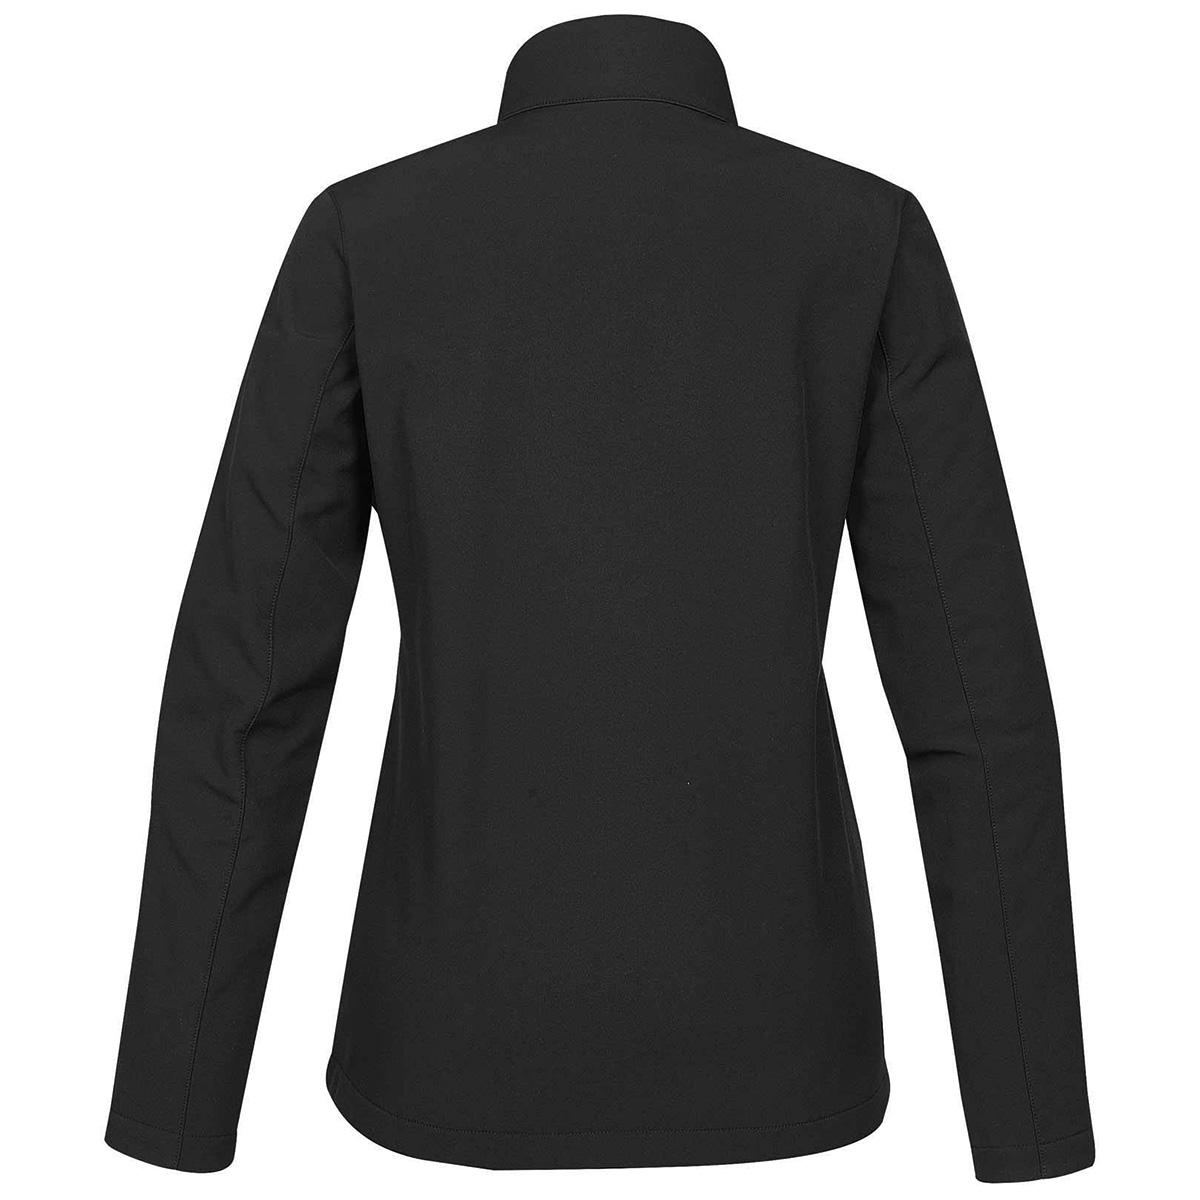 Stormtech Womens/Ladies Orbiter Softshell Jacket (XL) (Navy/Carbon)